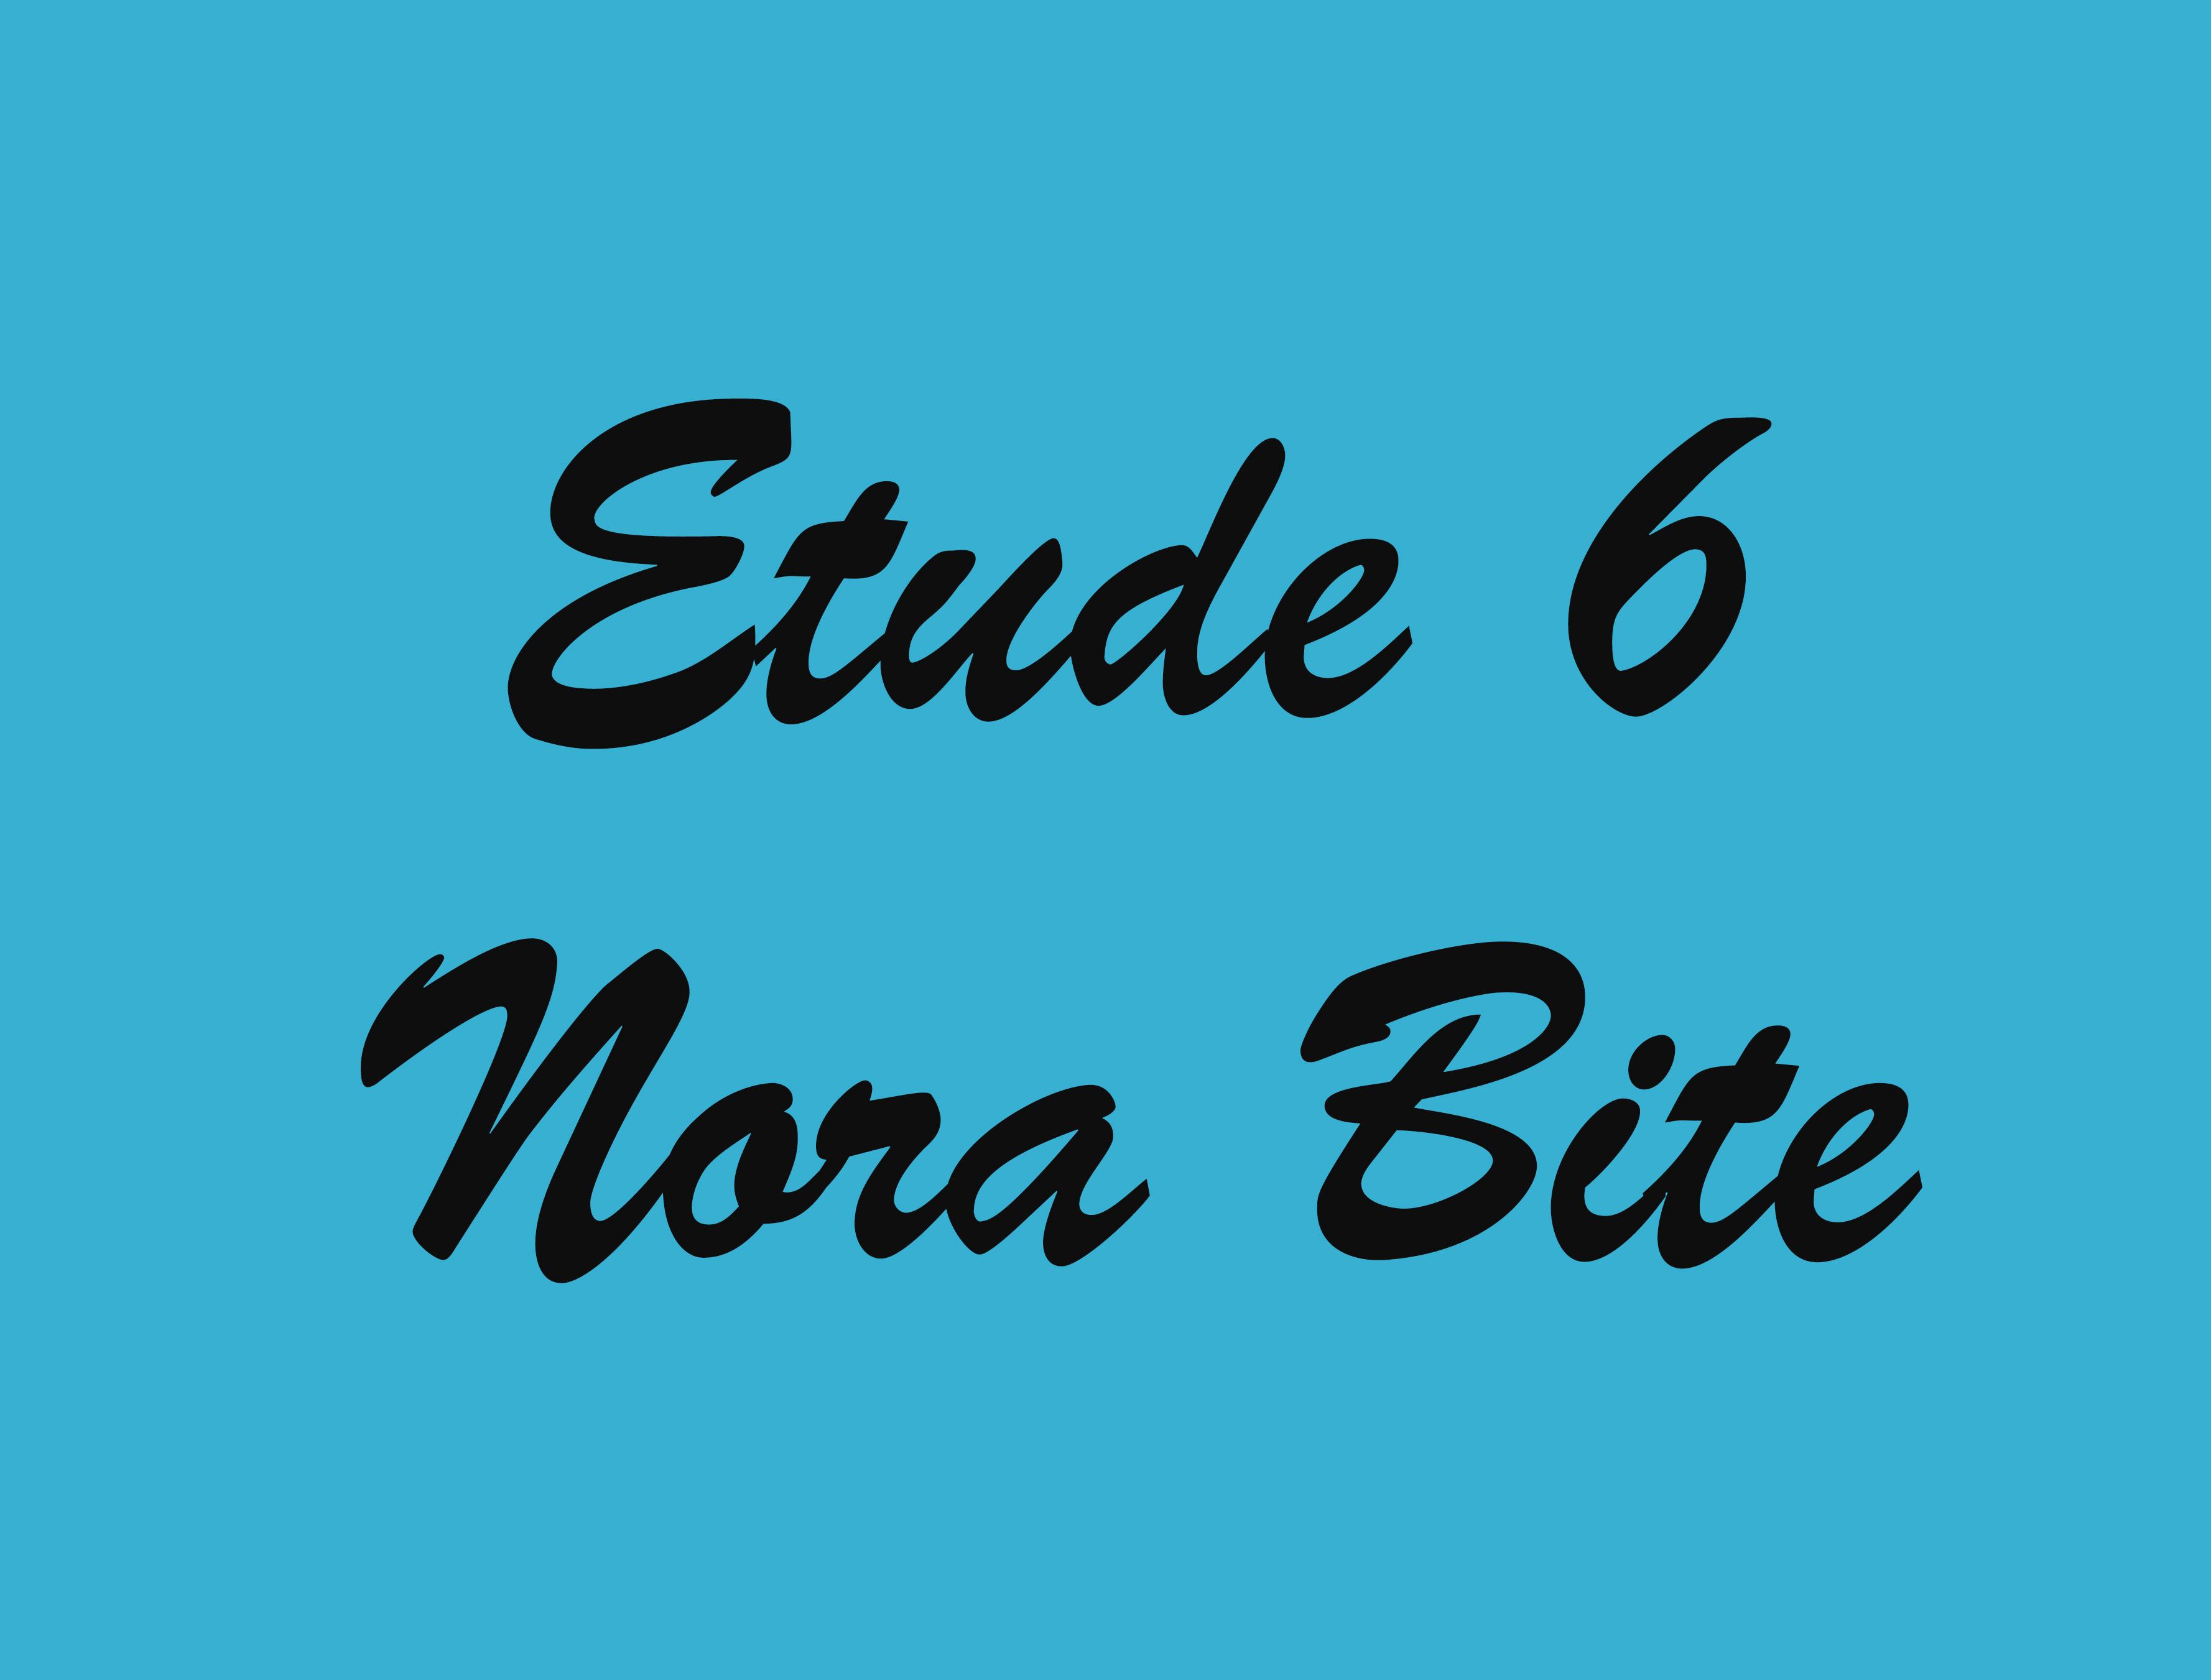 etude 6 modern jazz guitar etudes for practicing modern jazz guitar voicings fingerstyle